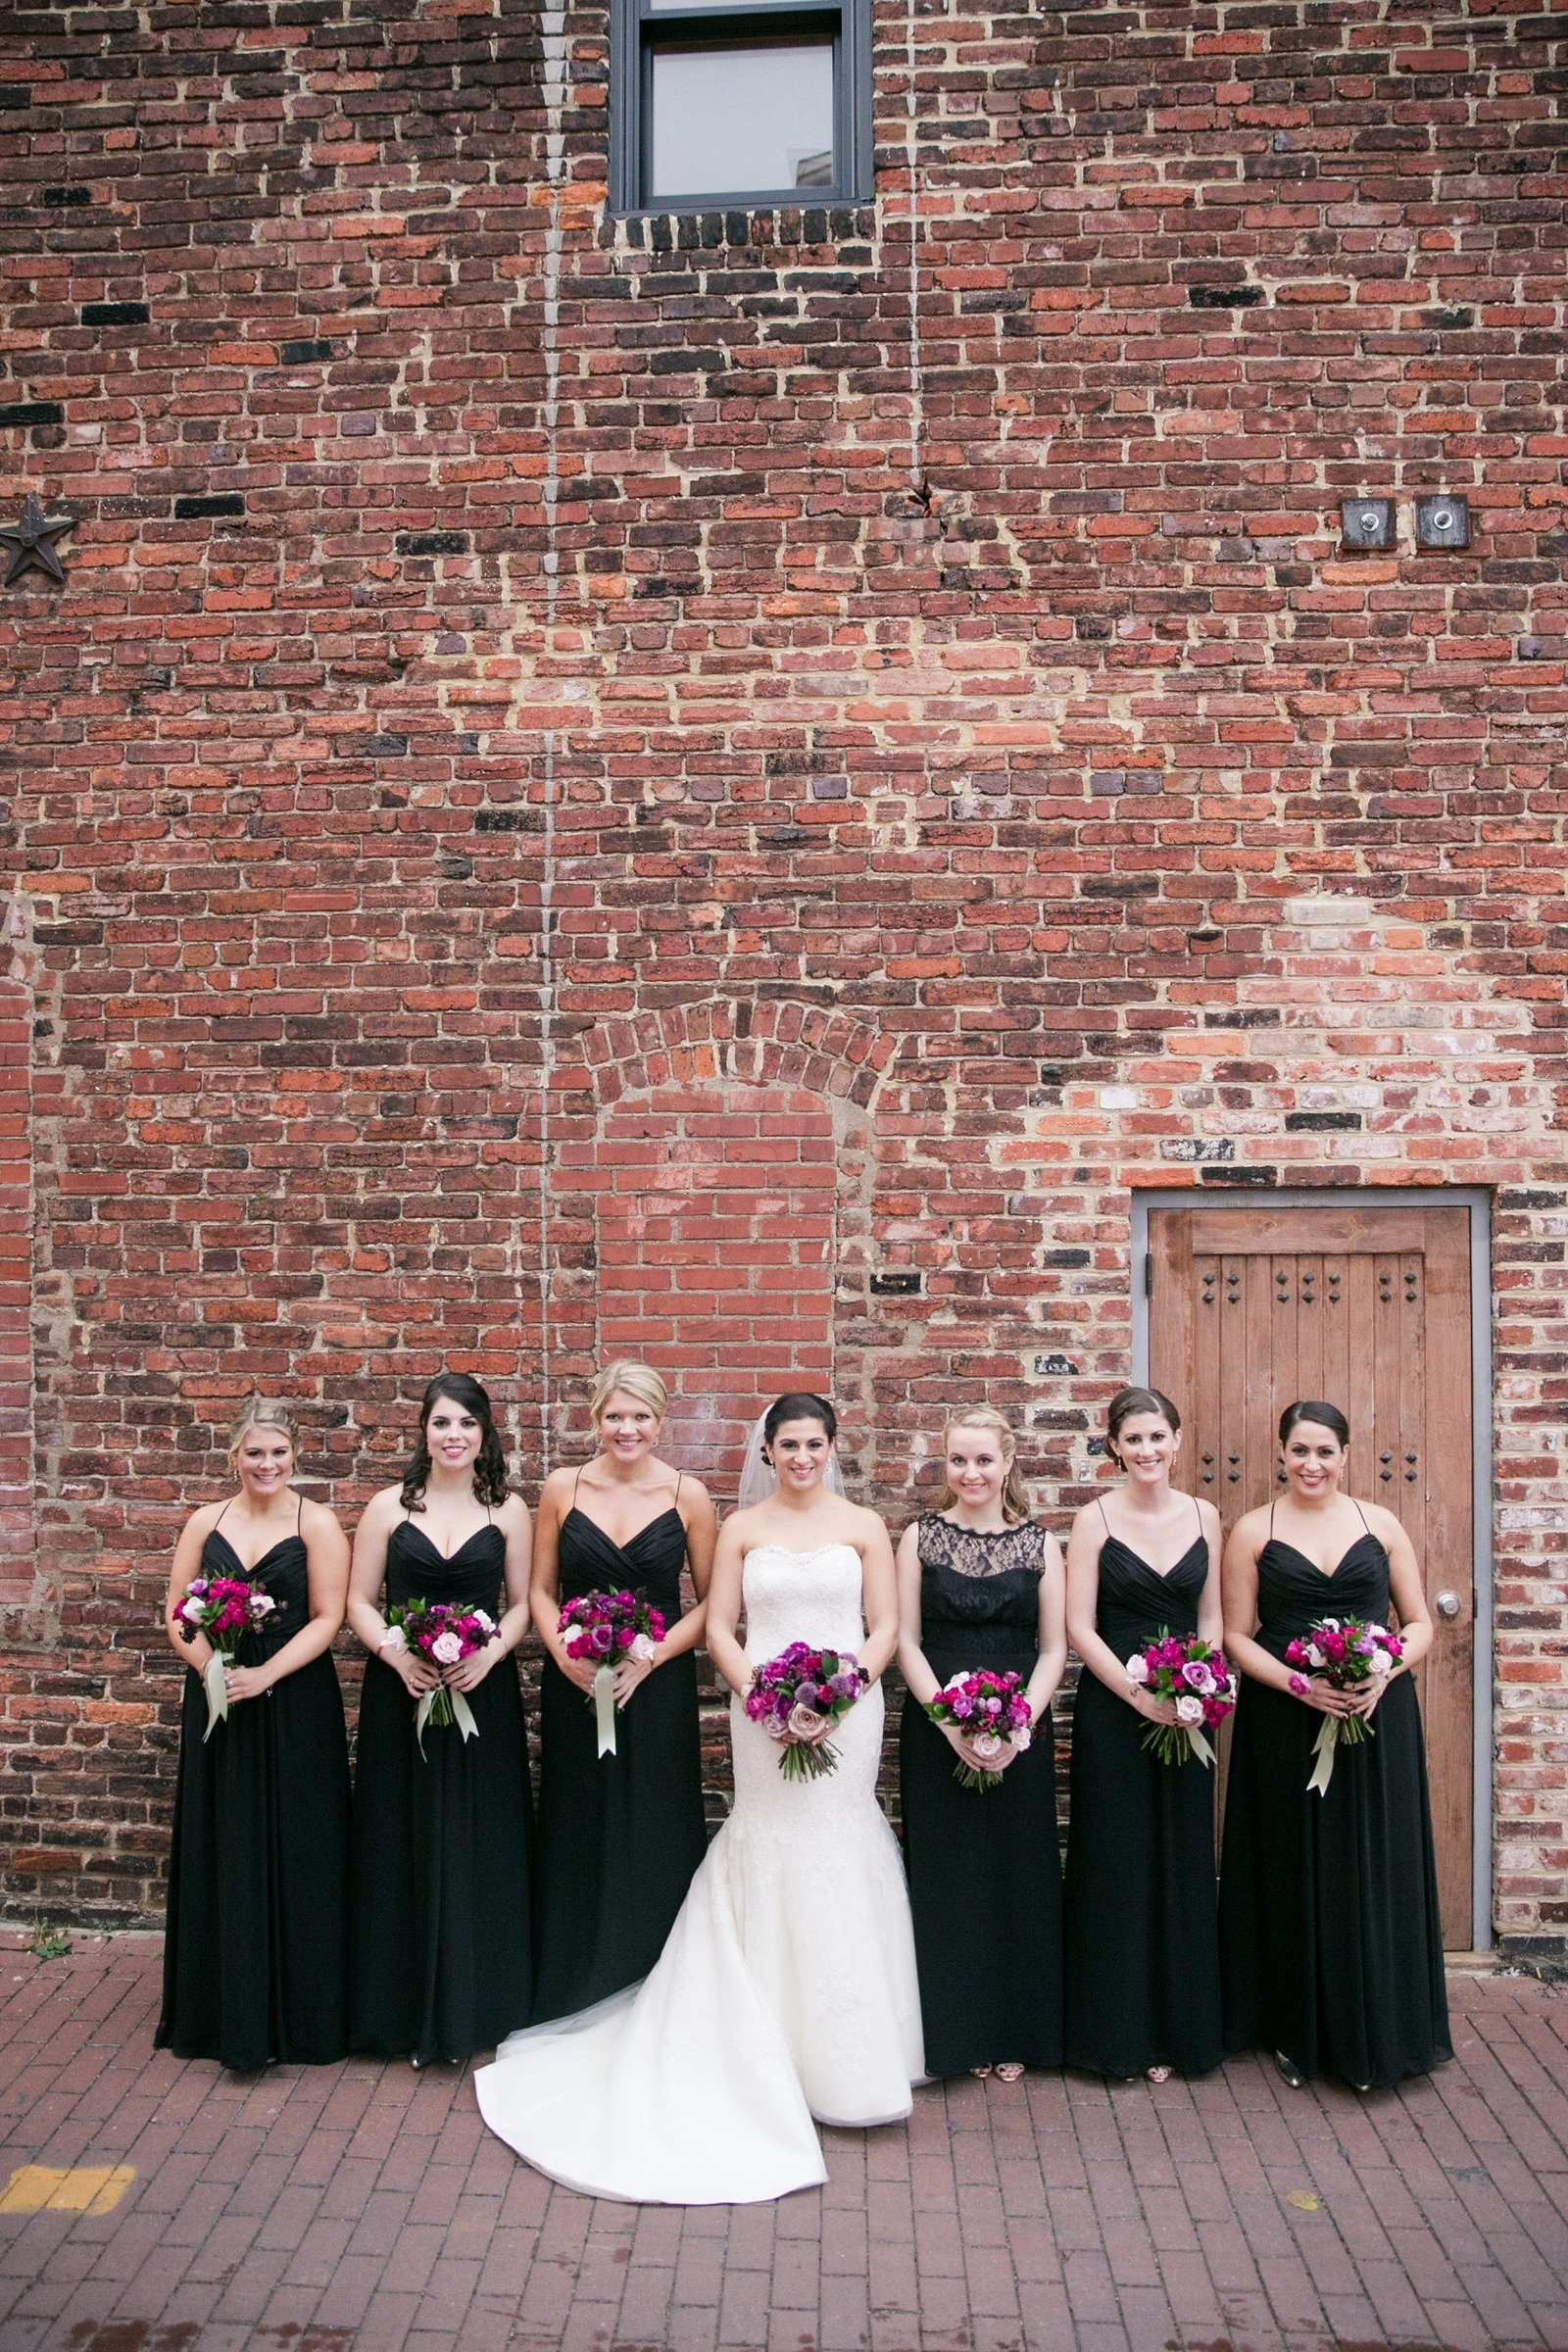 Black-tie-wedding-photos-longview-gallery-dc (161)